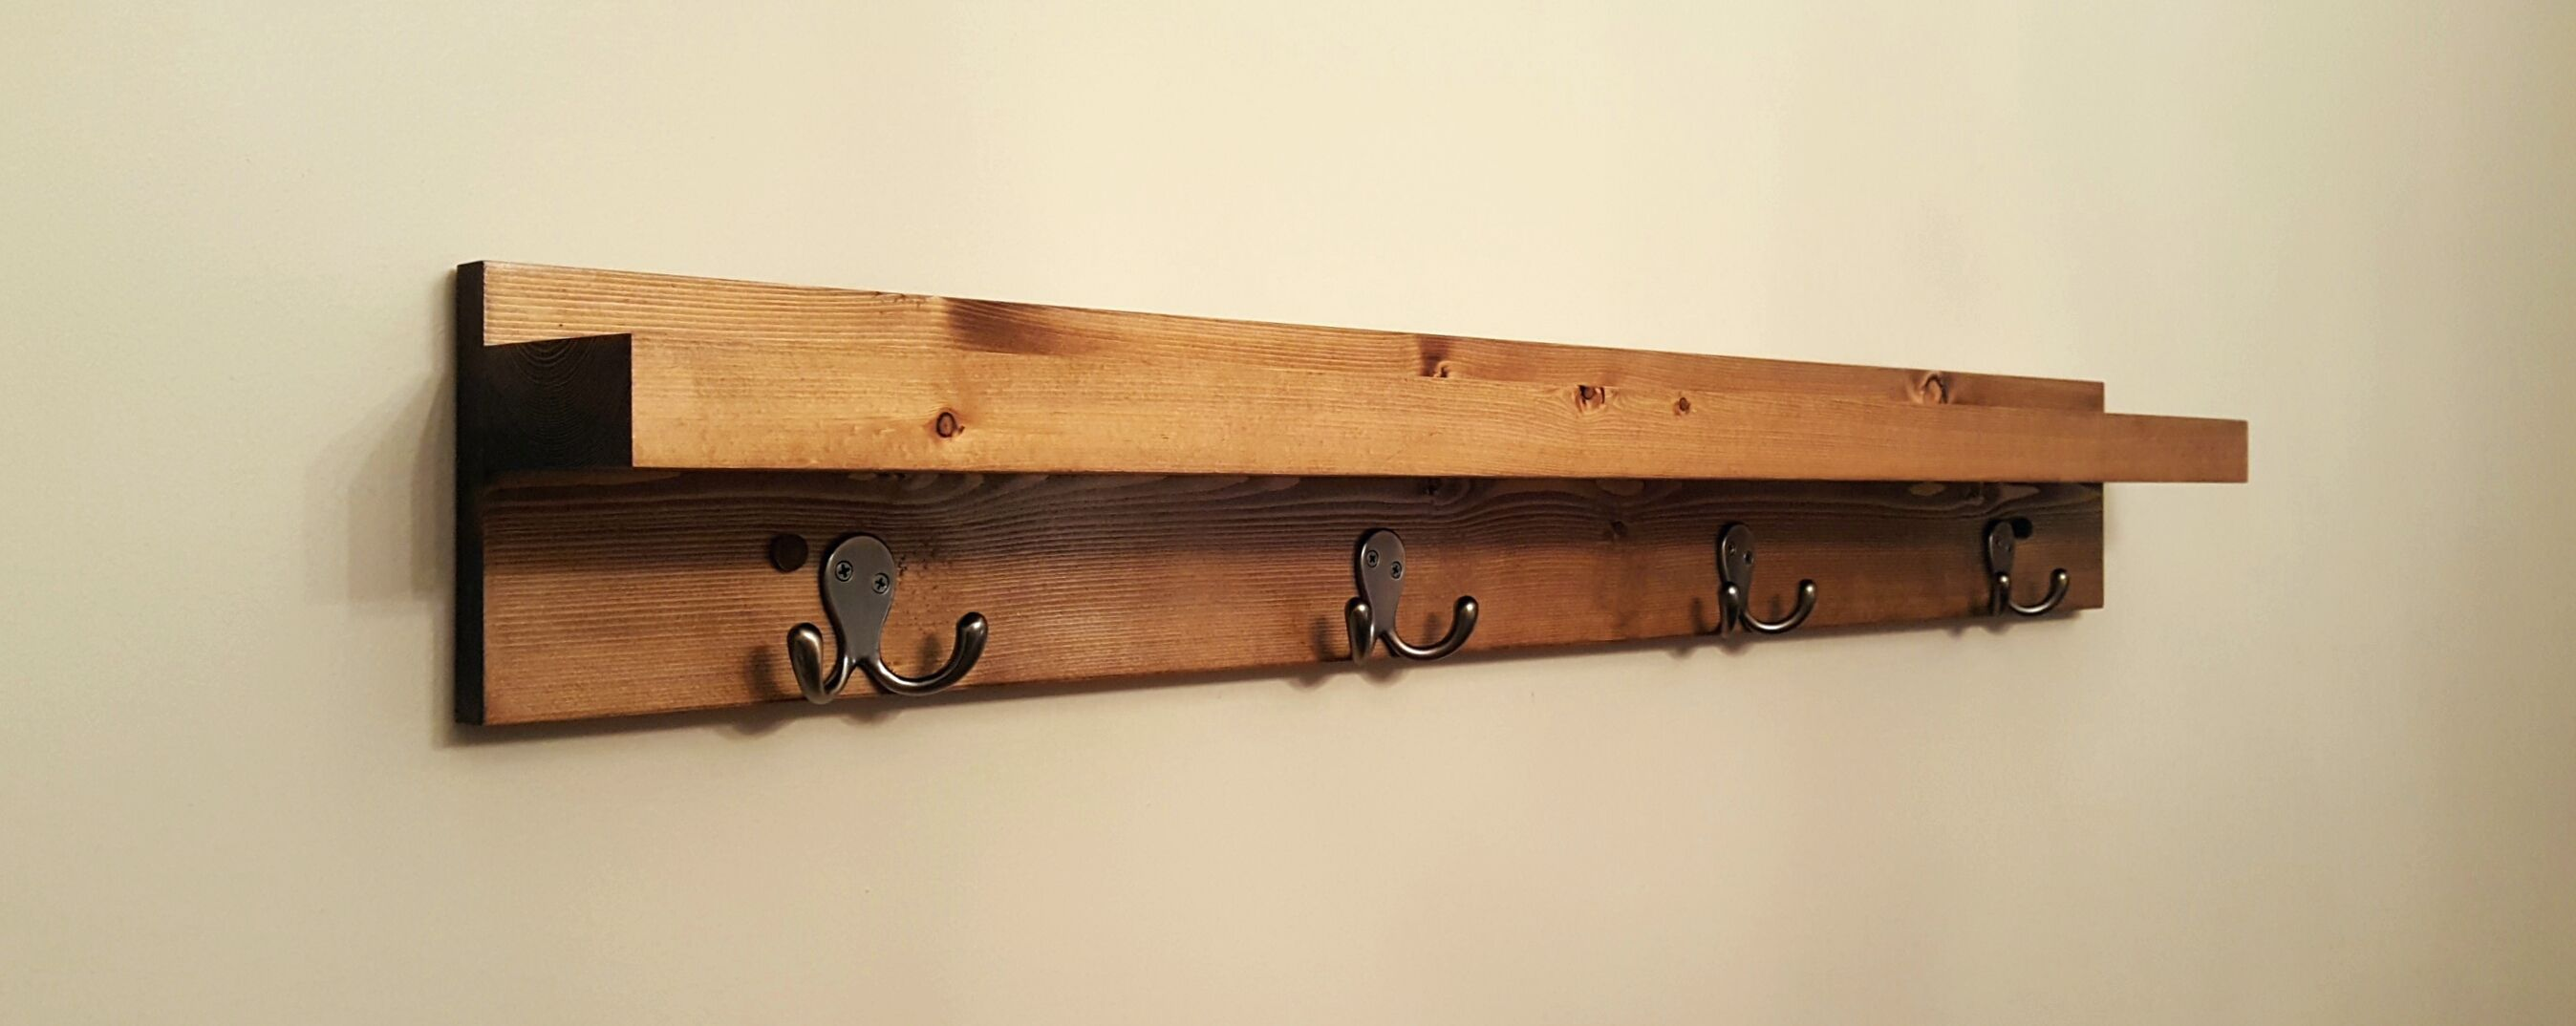 "40"" Wooden coat rack w/shelf and 4 double hooks"